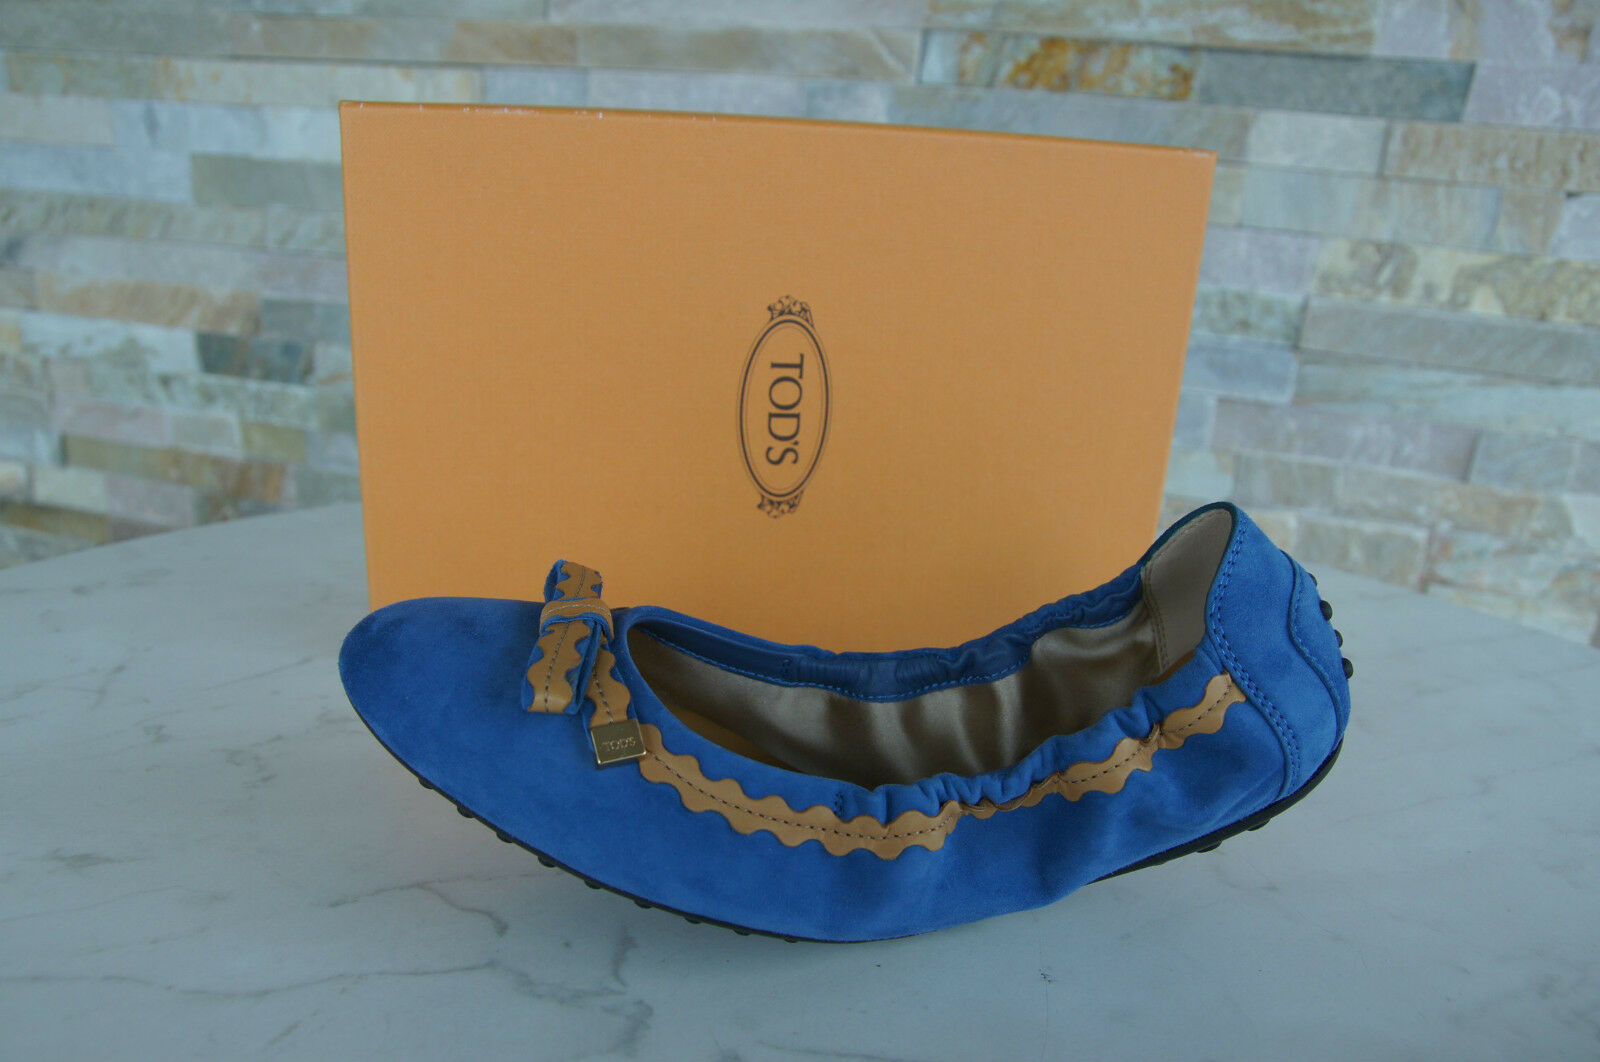 negozio d'offerta Tods Morte ´ S Gr Gr Gr 38 Scarpe Ballerine Scarpe Blu Marrone Nuovo Origin.  ordinare on-line